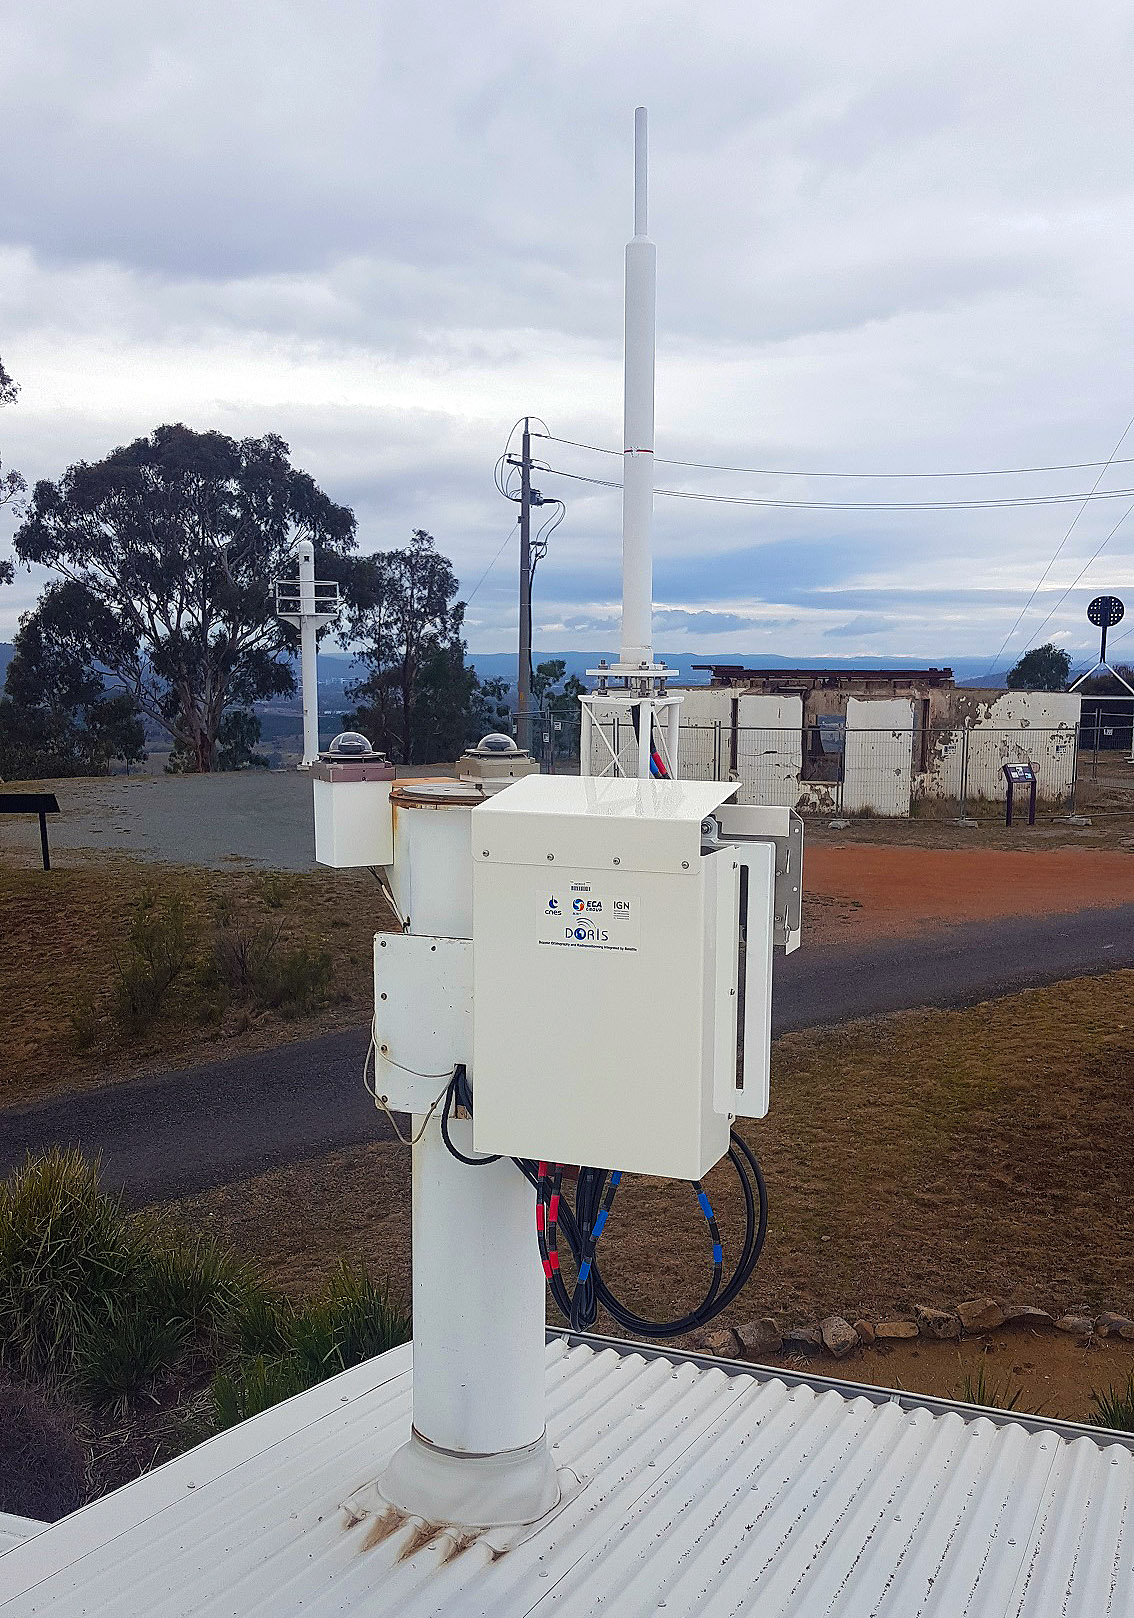 DORIS station: MOUNT-STROMLO - AUSTRALIA